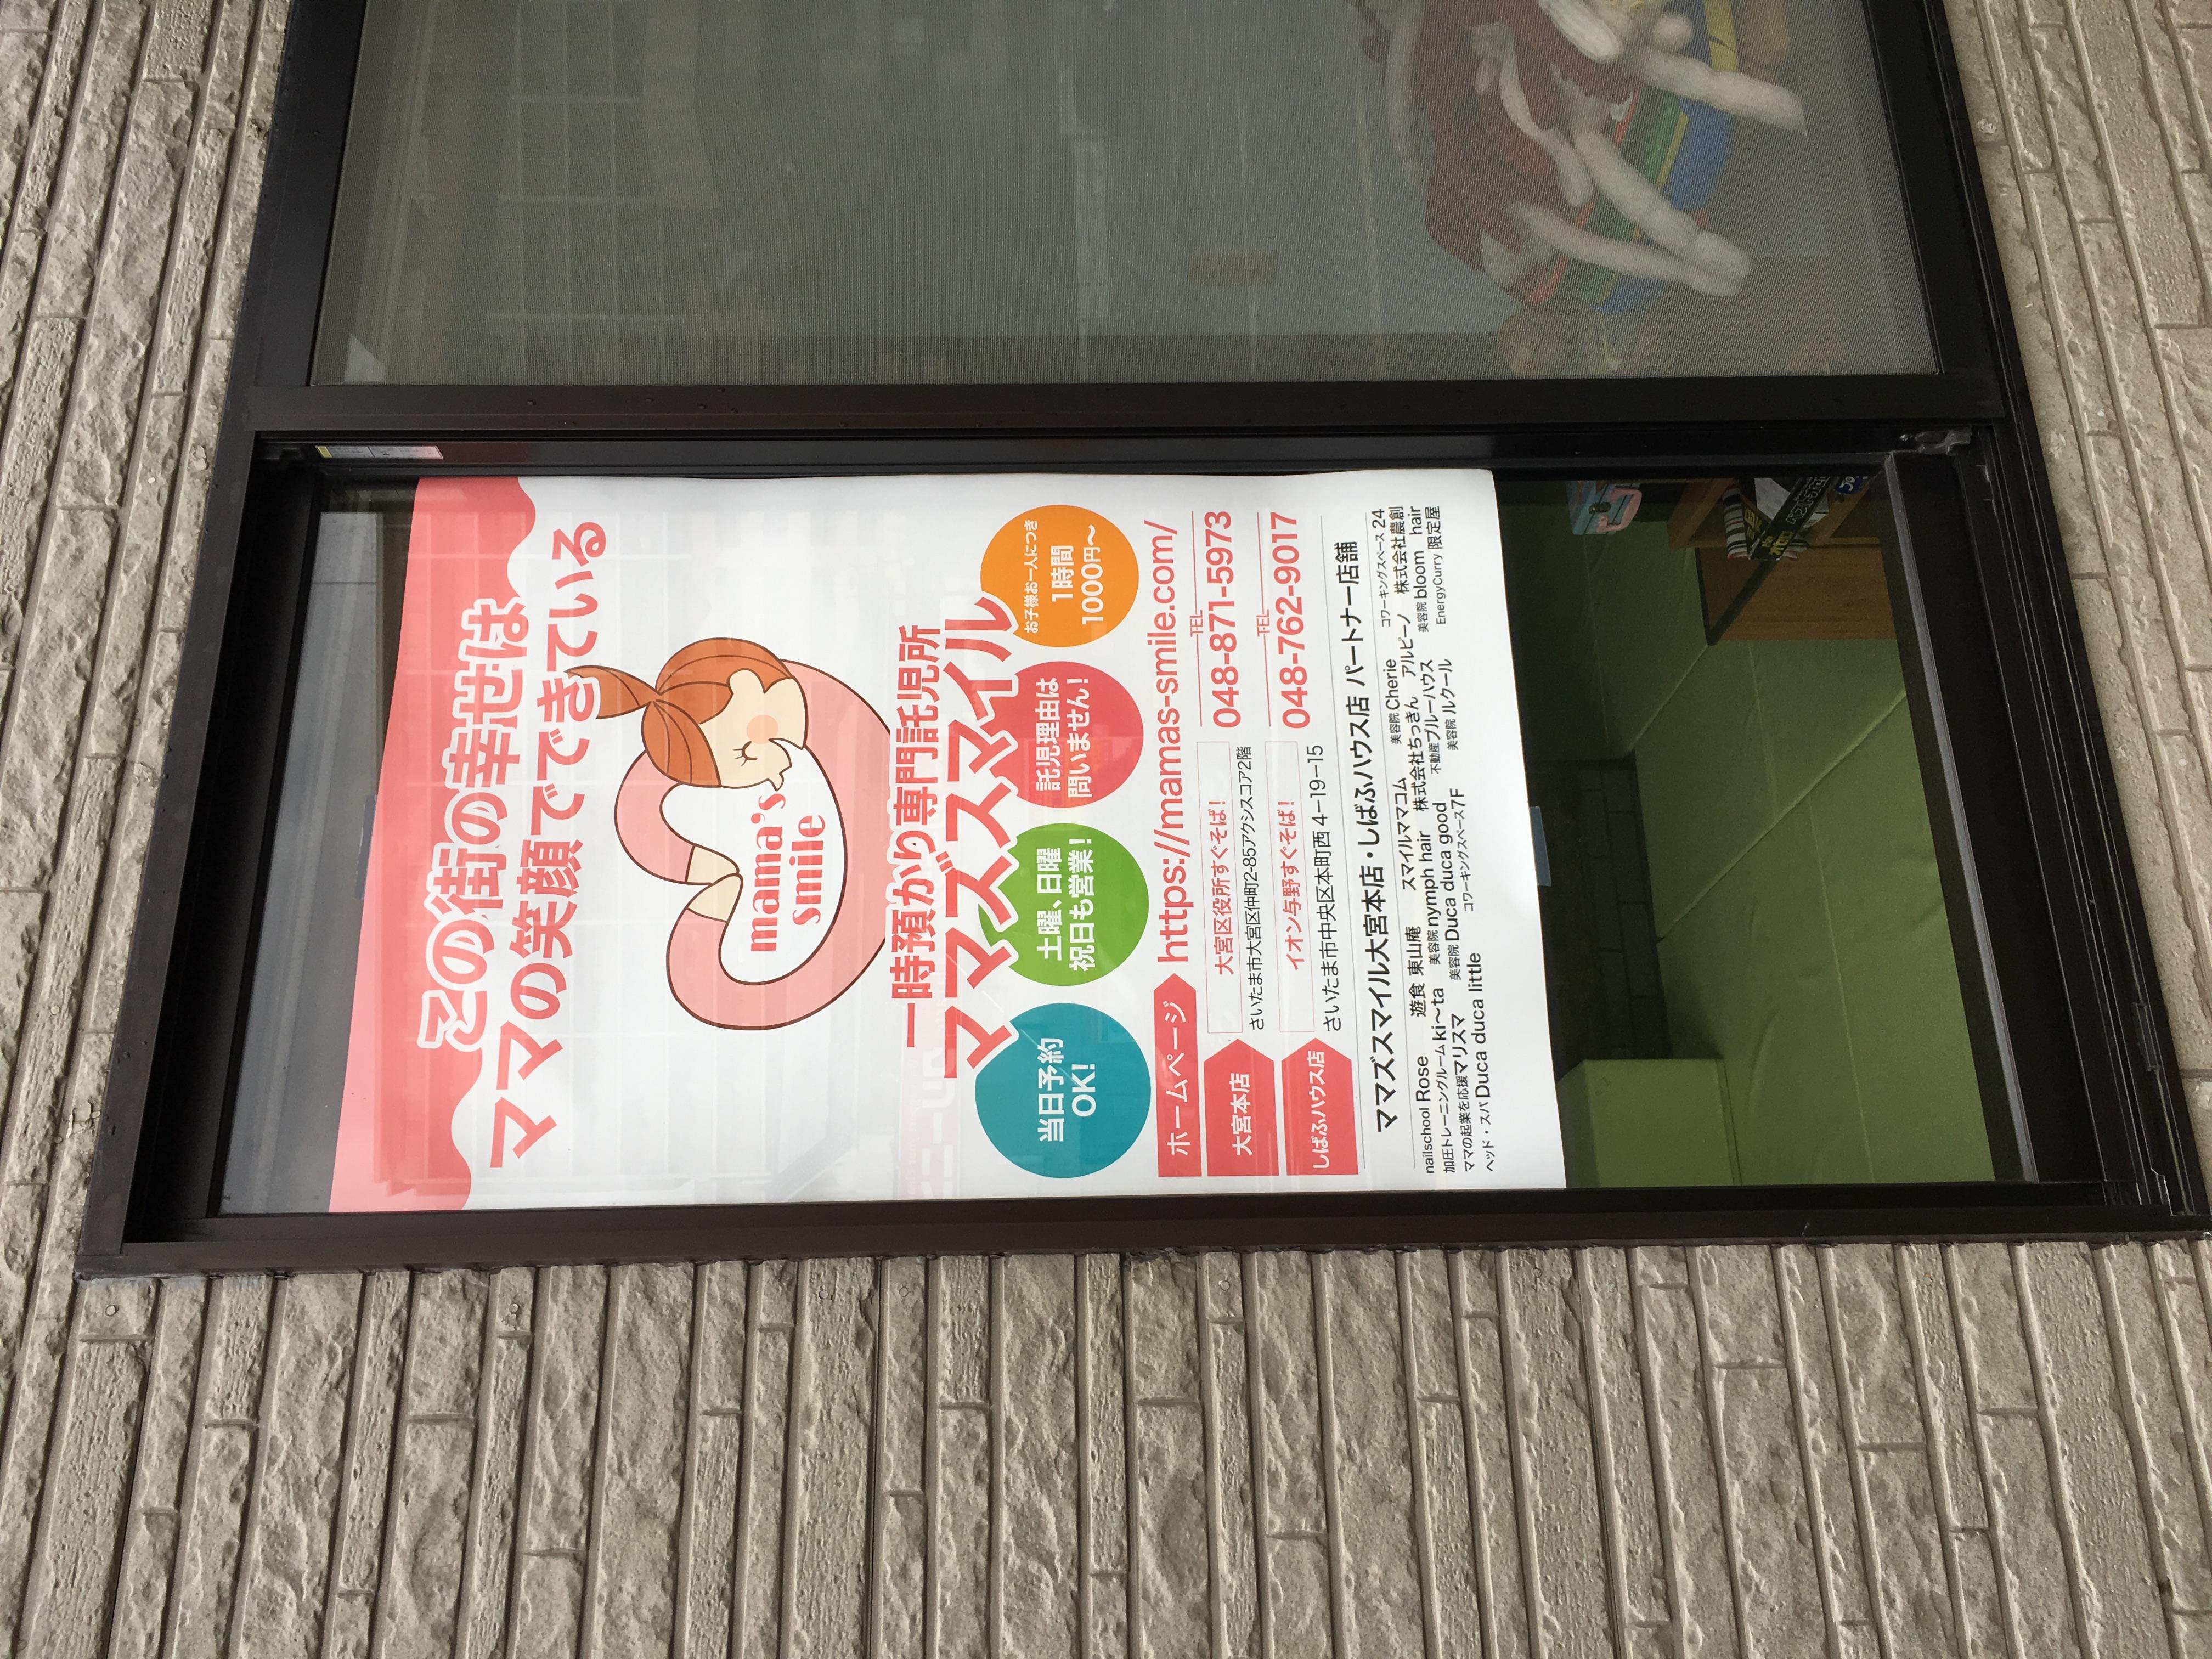 2016-11-01 10.19.44